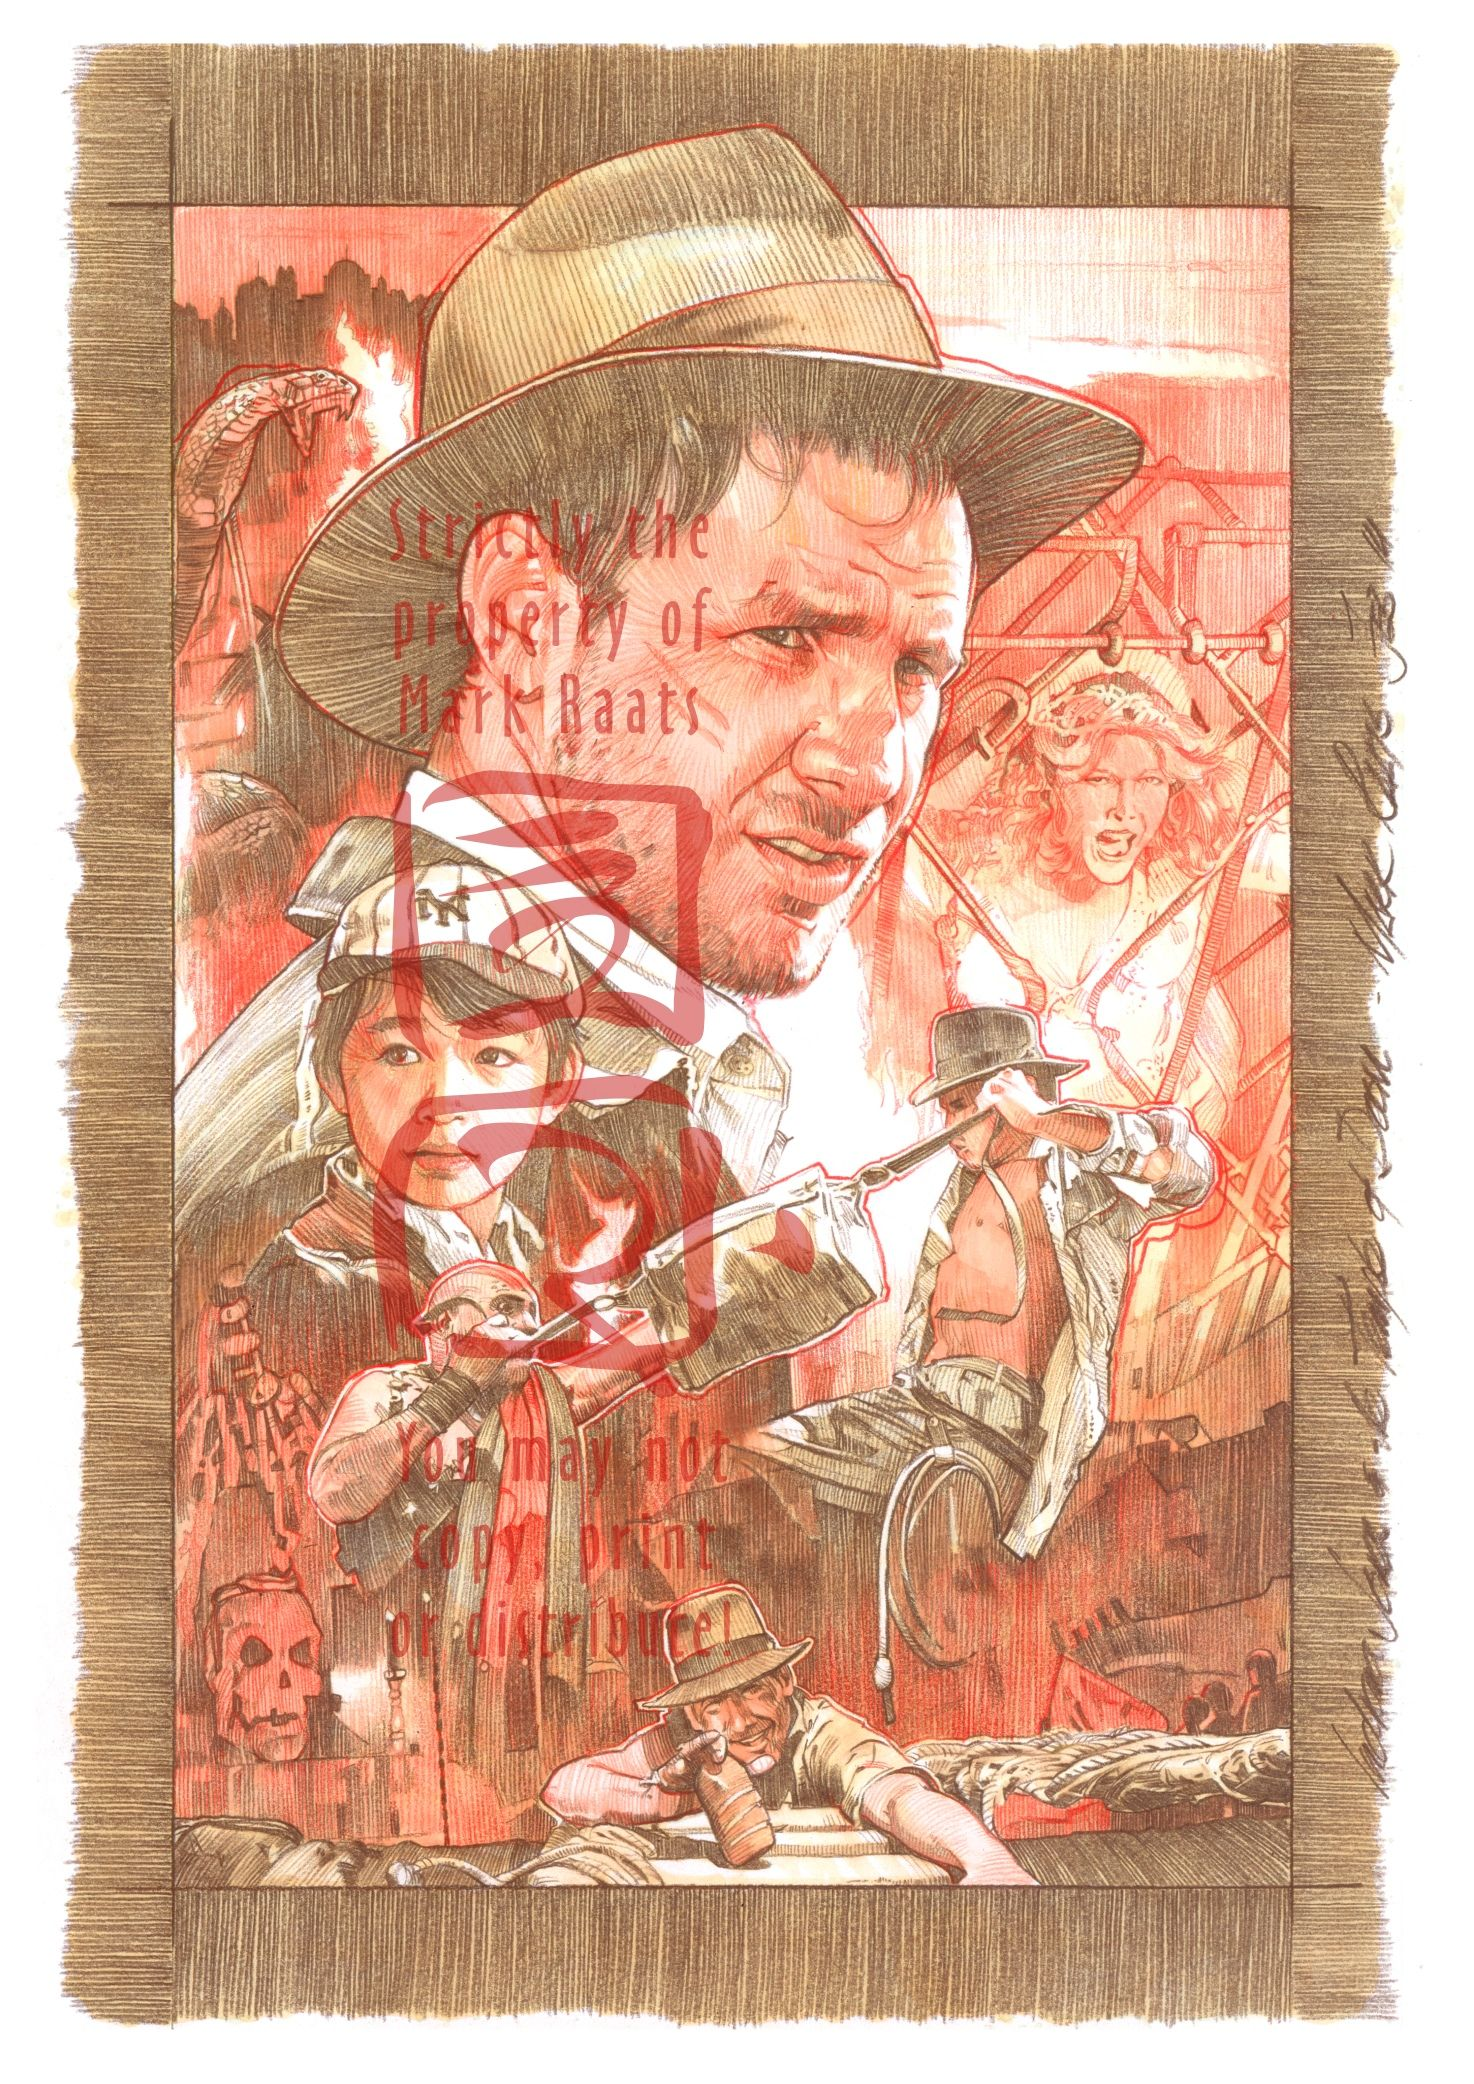 Indiana Jones and the Temple of Doom - Final Comp. by MarkRaats on deviantART